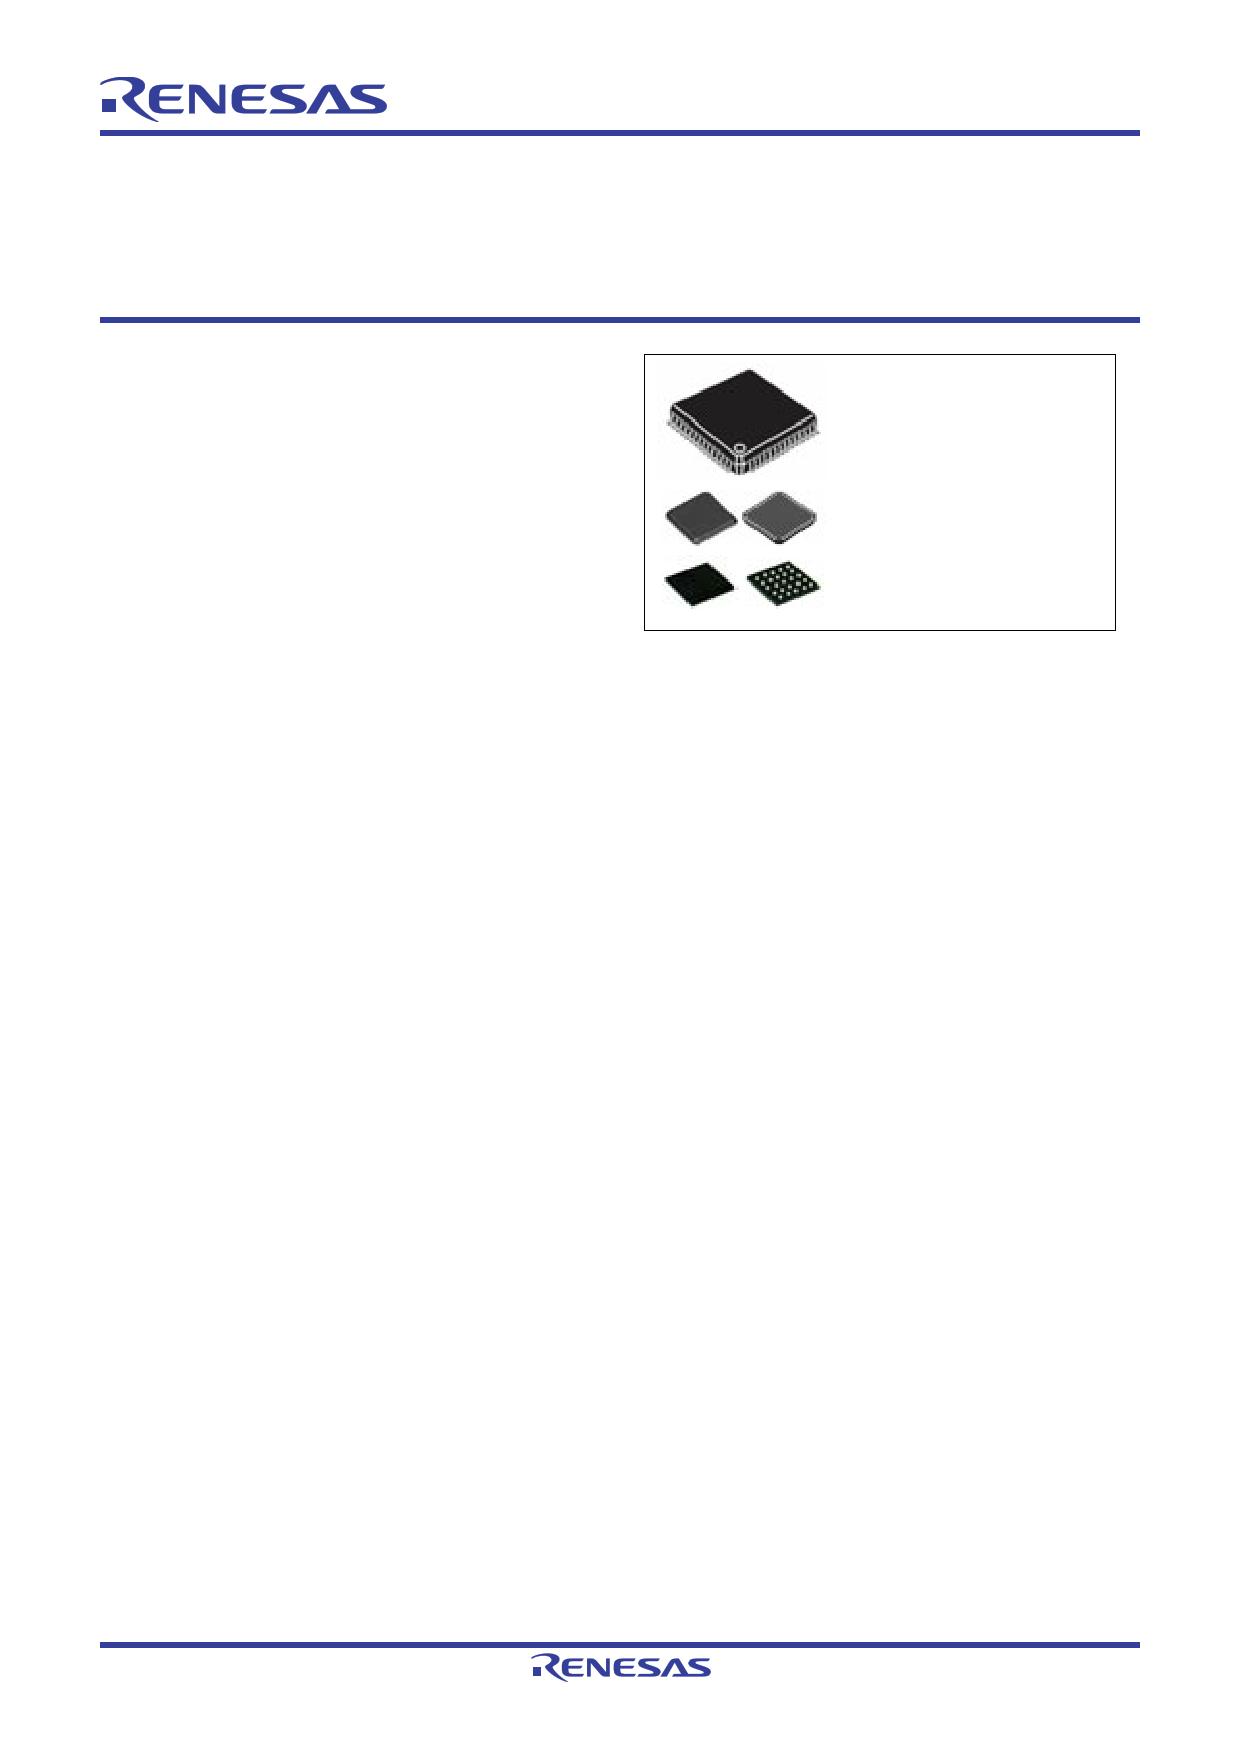 R5F51104ADFM 데이터시트 및 R5F51104ADFM PDF